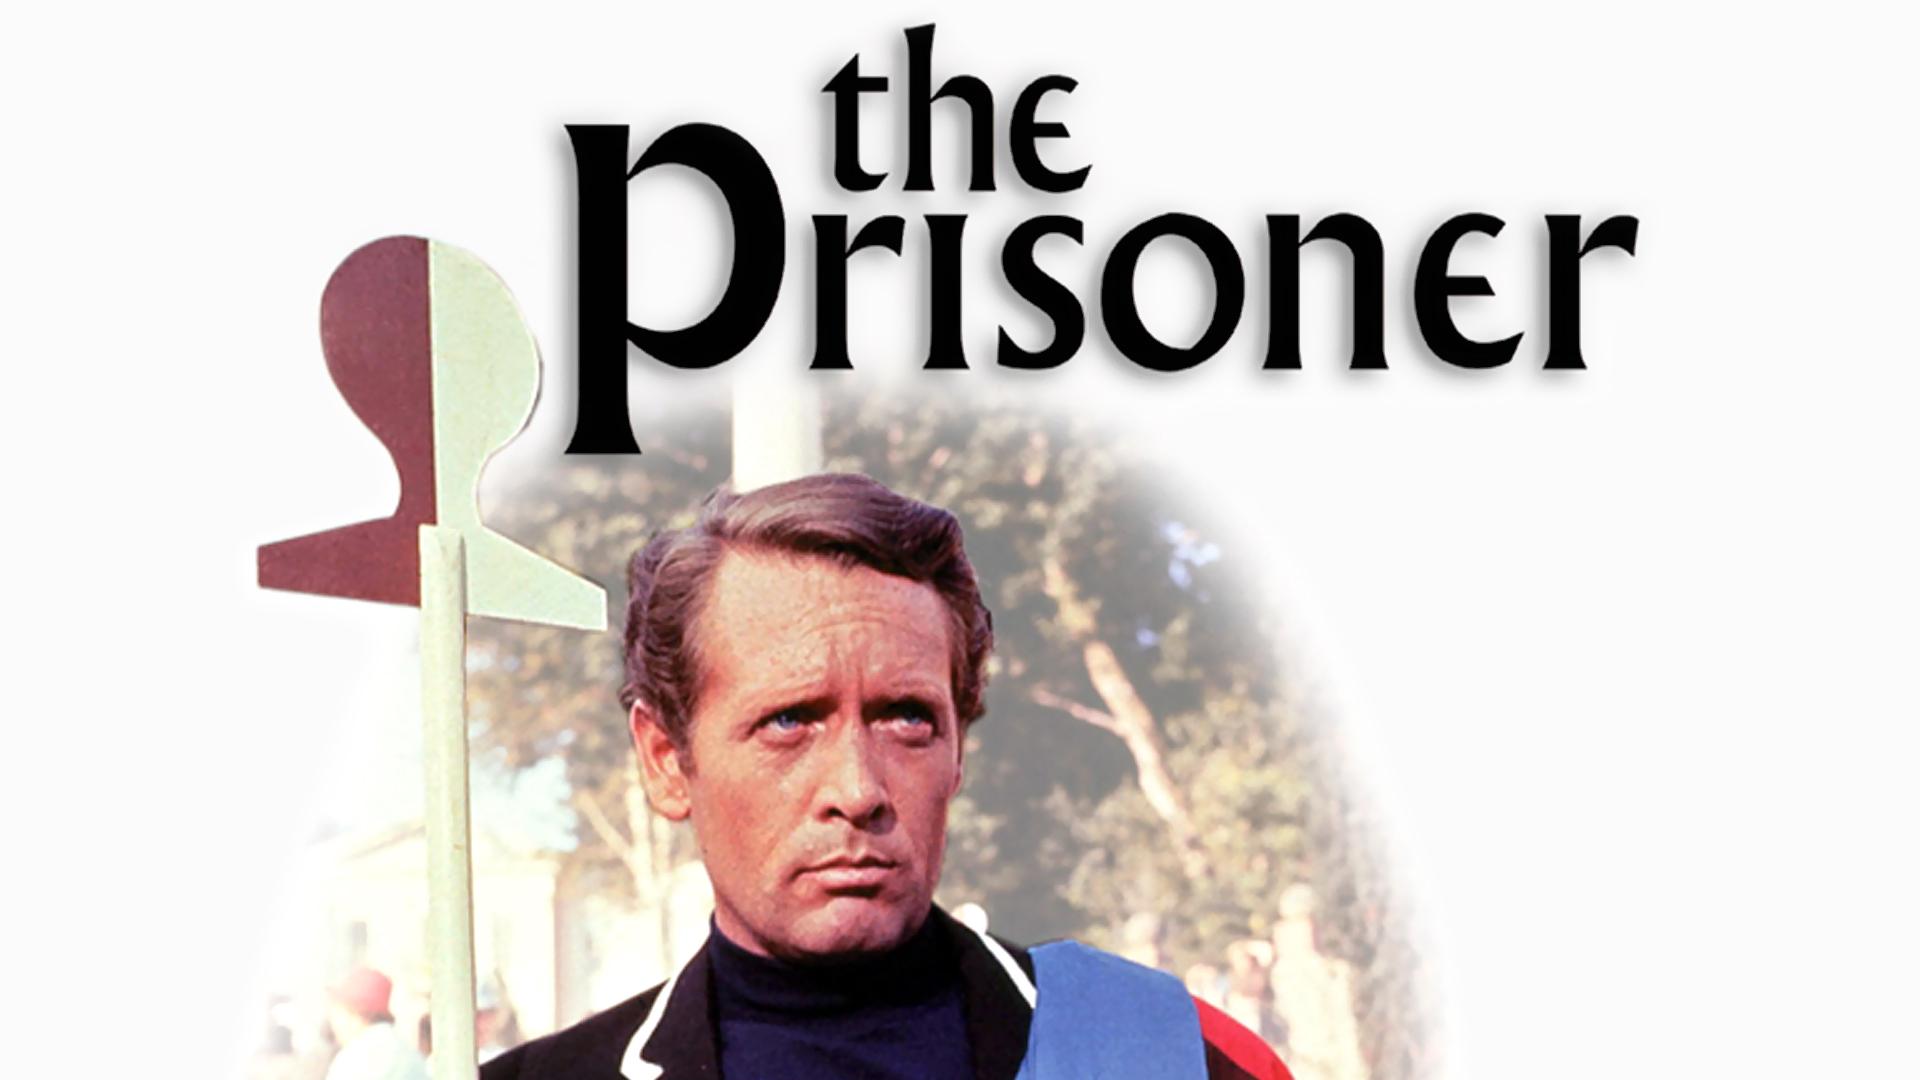 The Prisoner Season 1